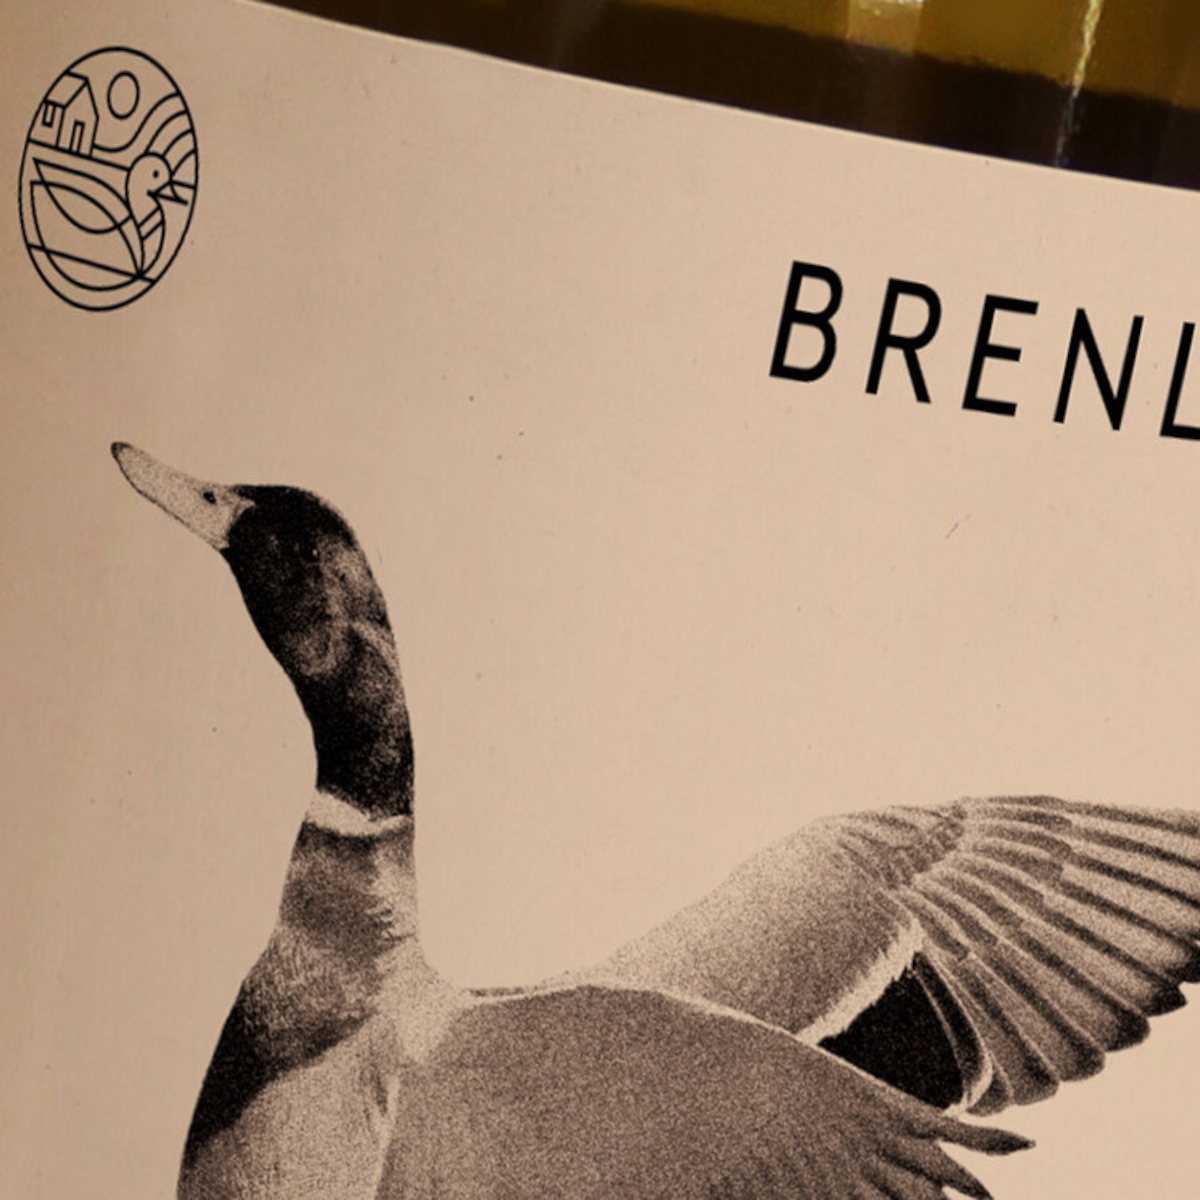 Label of Brenley Wine, produced at Brenley Farm, Faversham